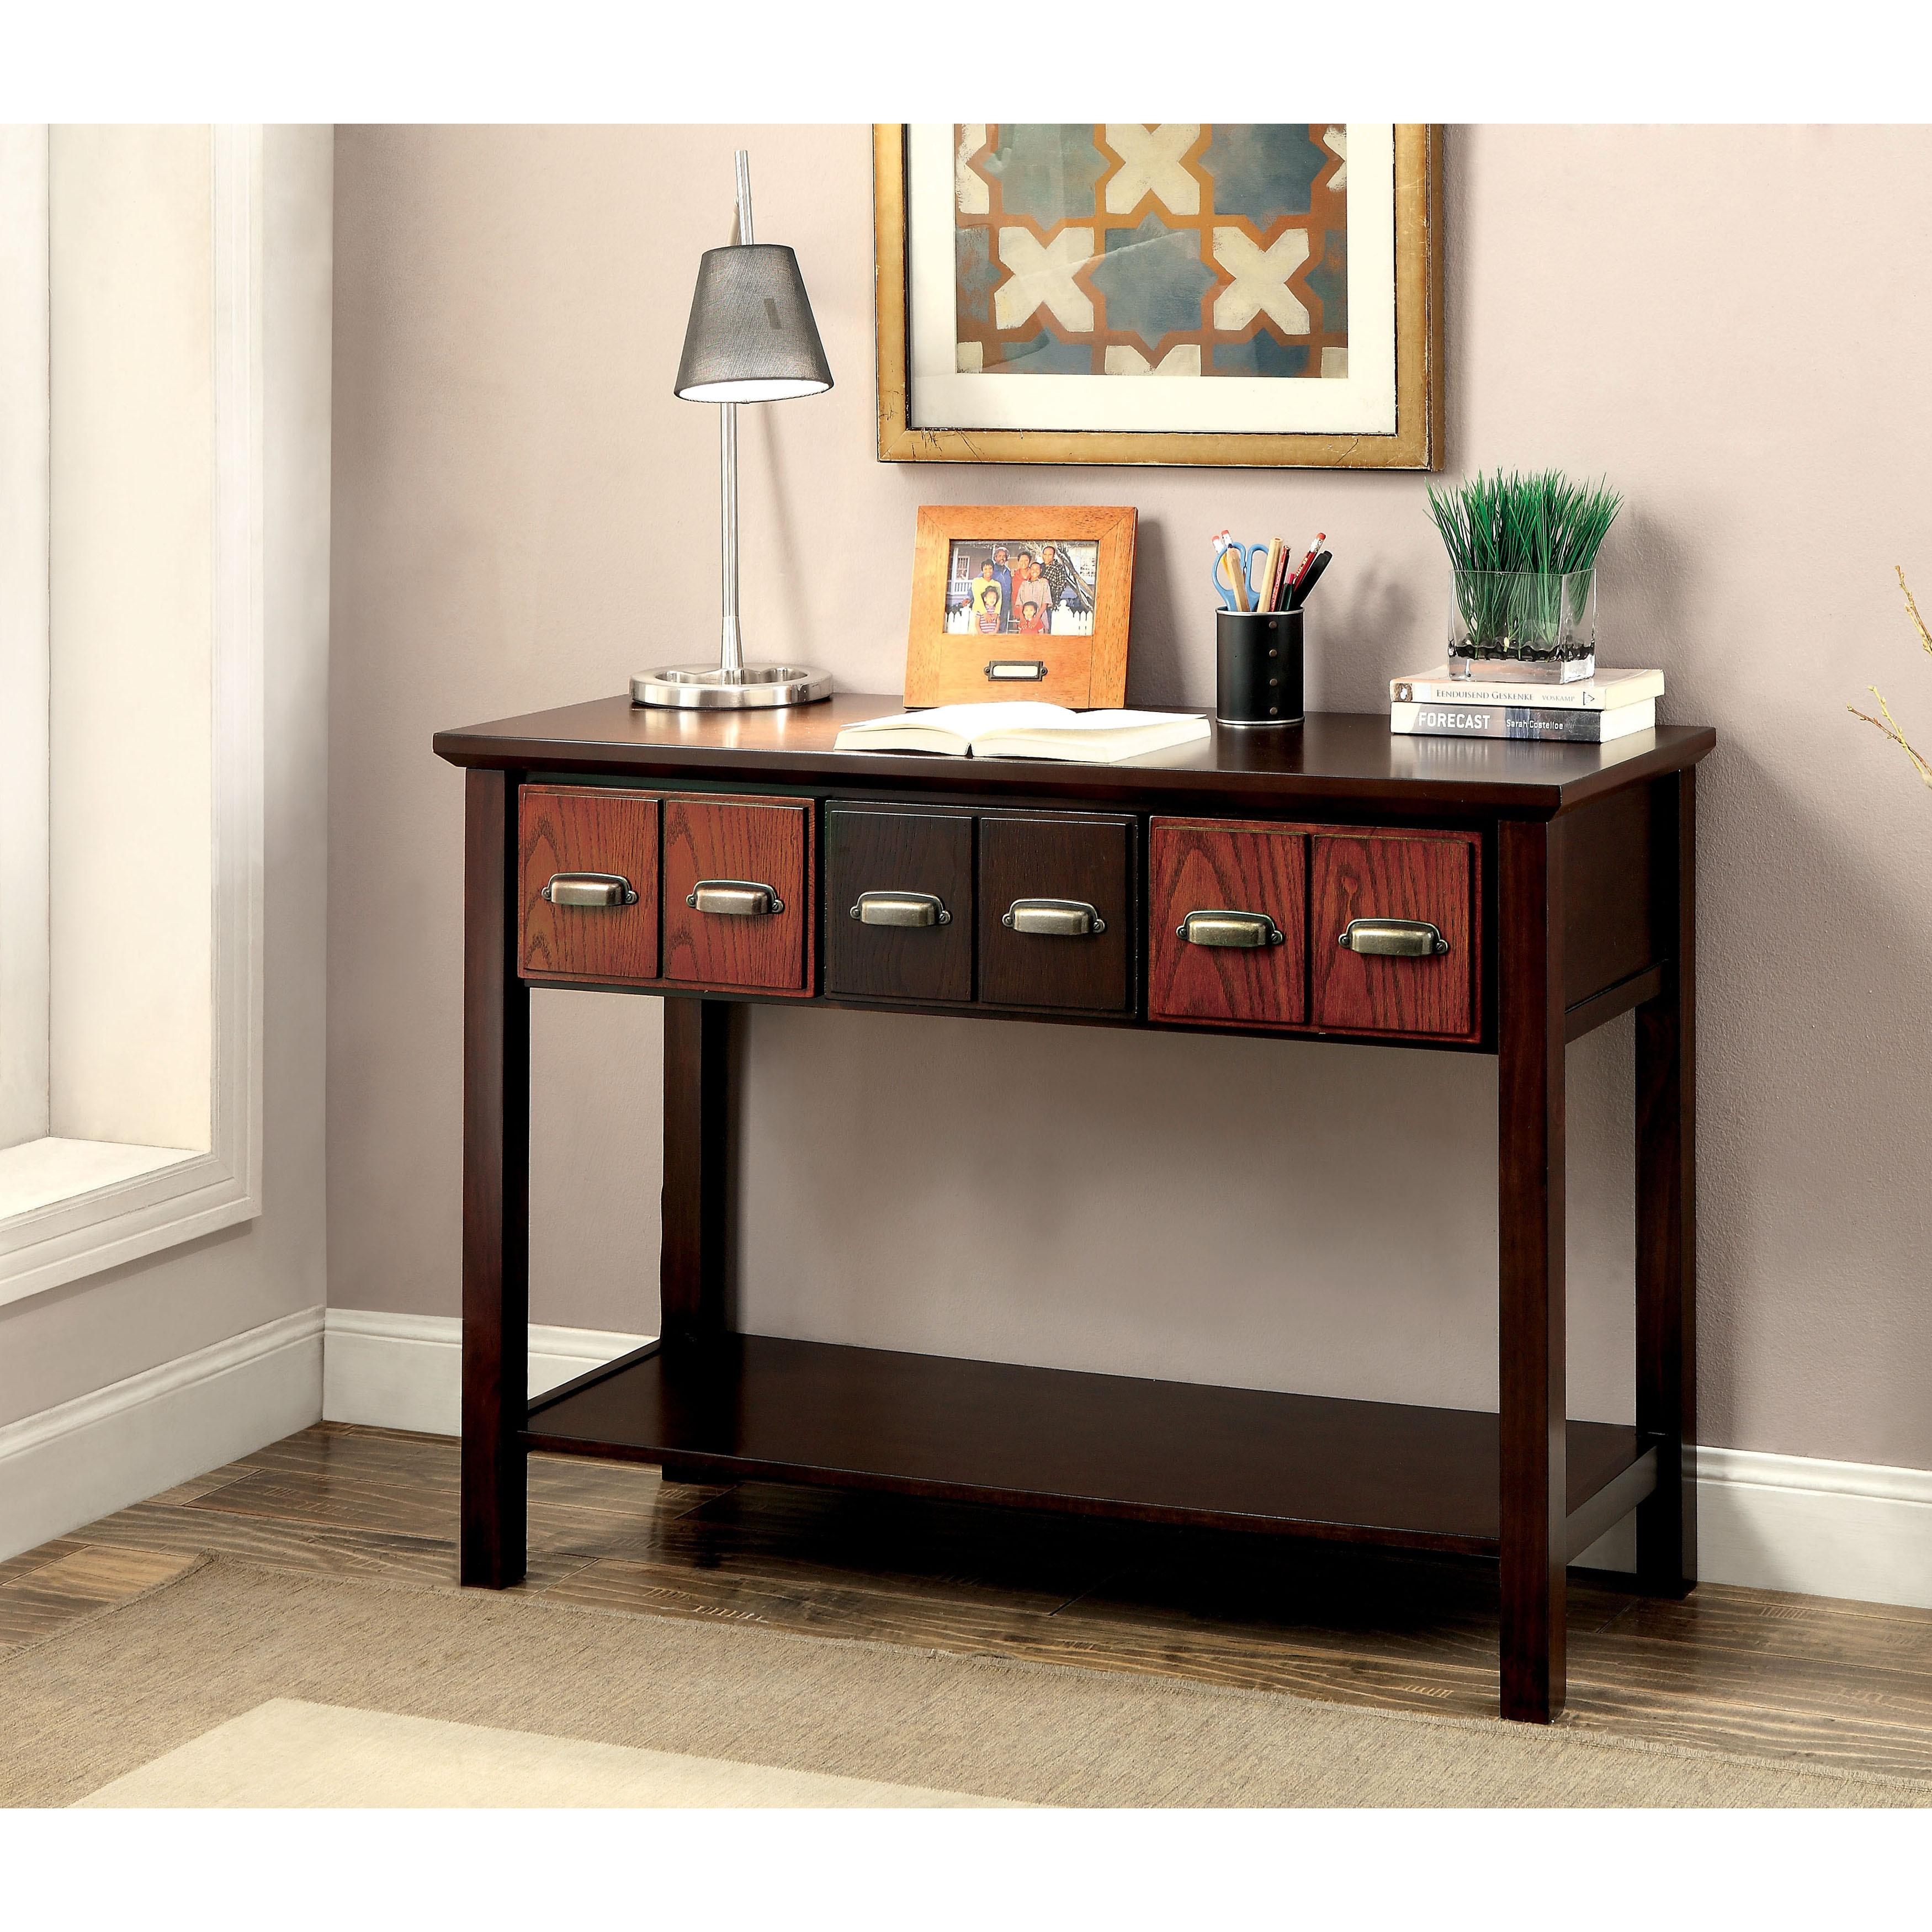 Furniture of America Marcella Transitional Two-Tone 3-dra...